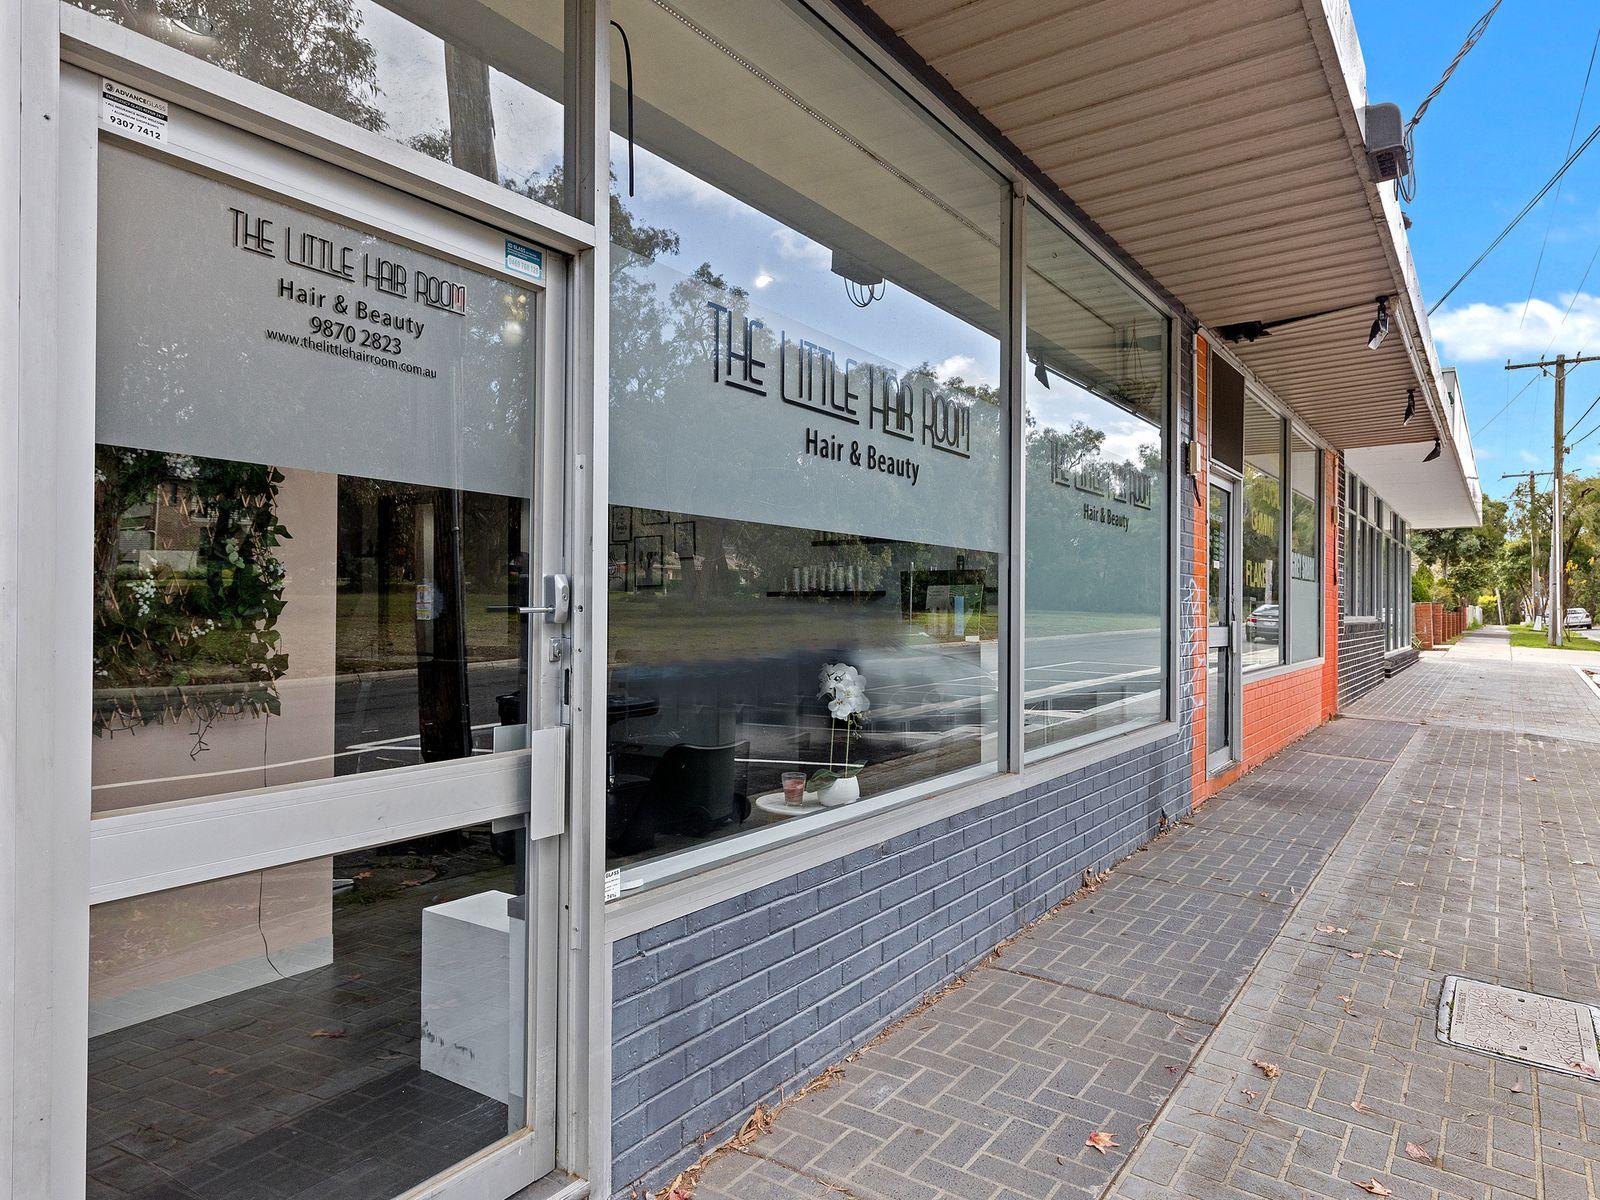 2/11 Old Lilydale Road, Ringwood East, VIC 3135